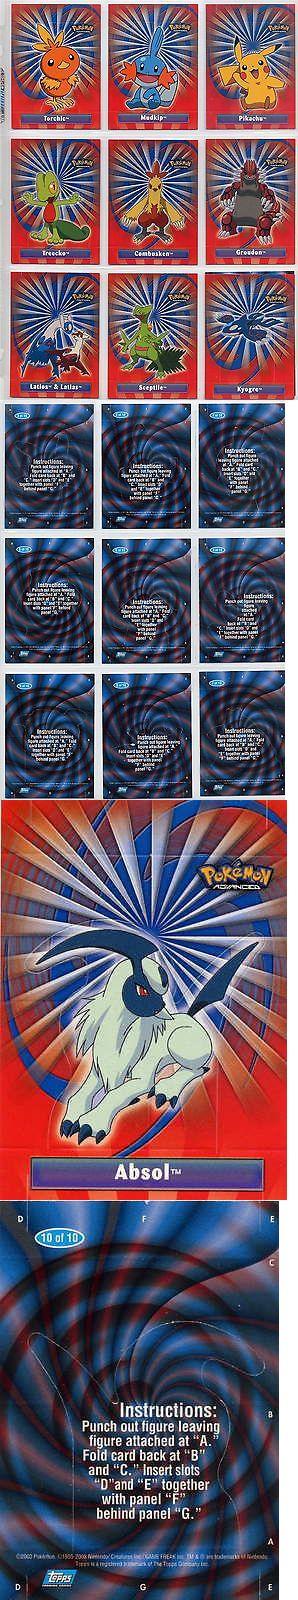 Pok mon Complete Sets 104046: Complete Topps Pokemon Advanced Insert Set! New 10 Card Pop-Up Set! L@@K! -> BUY IT NOW ONLY: $31.79 on eBay!